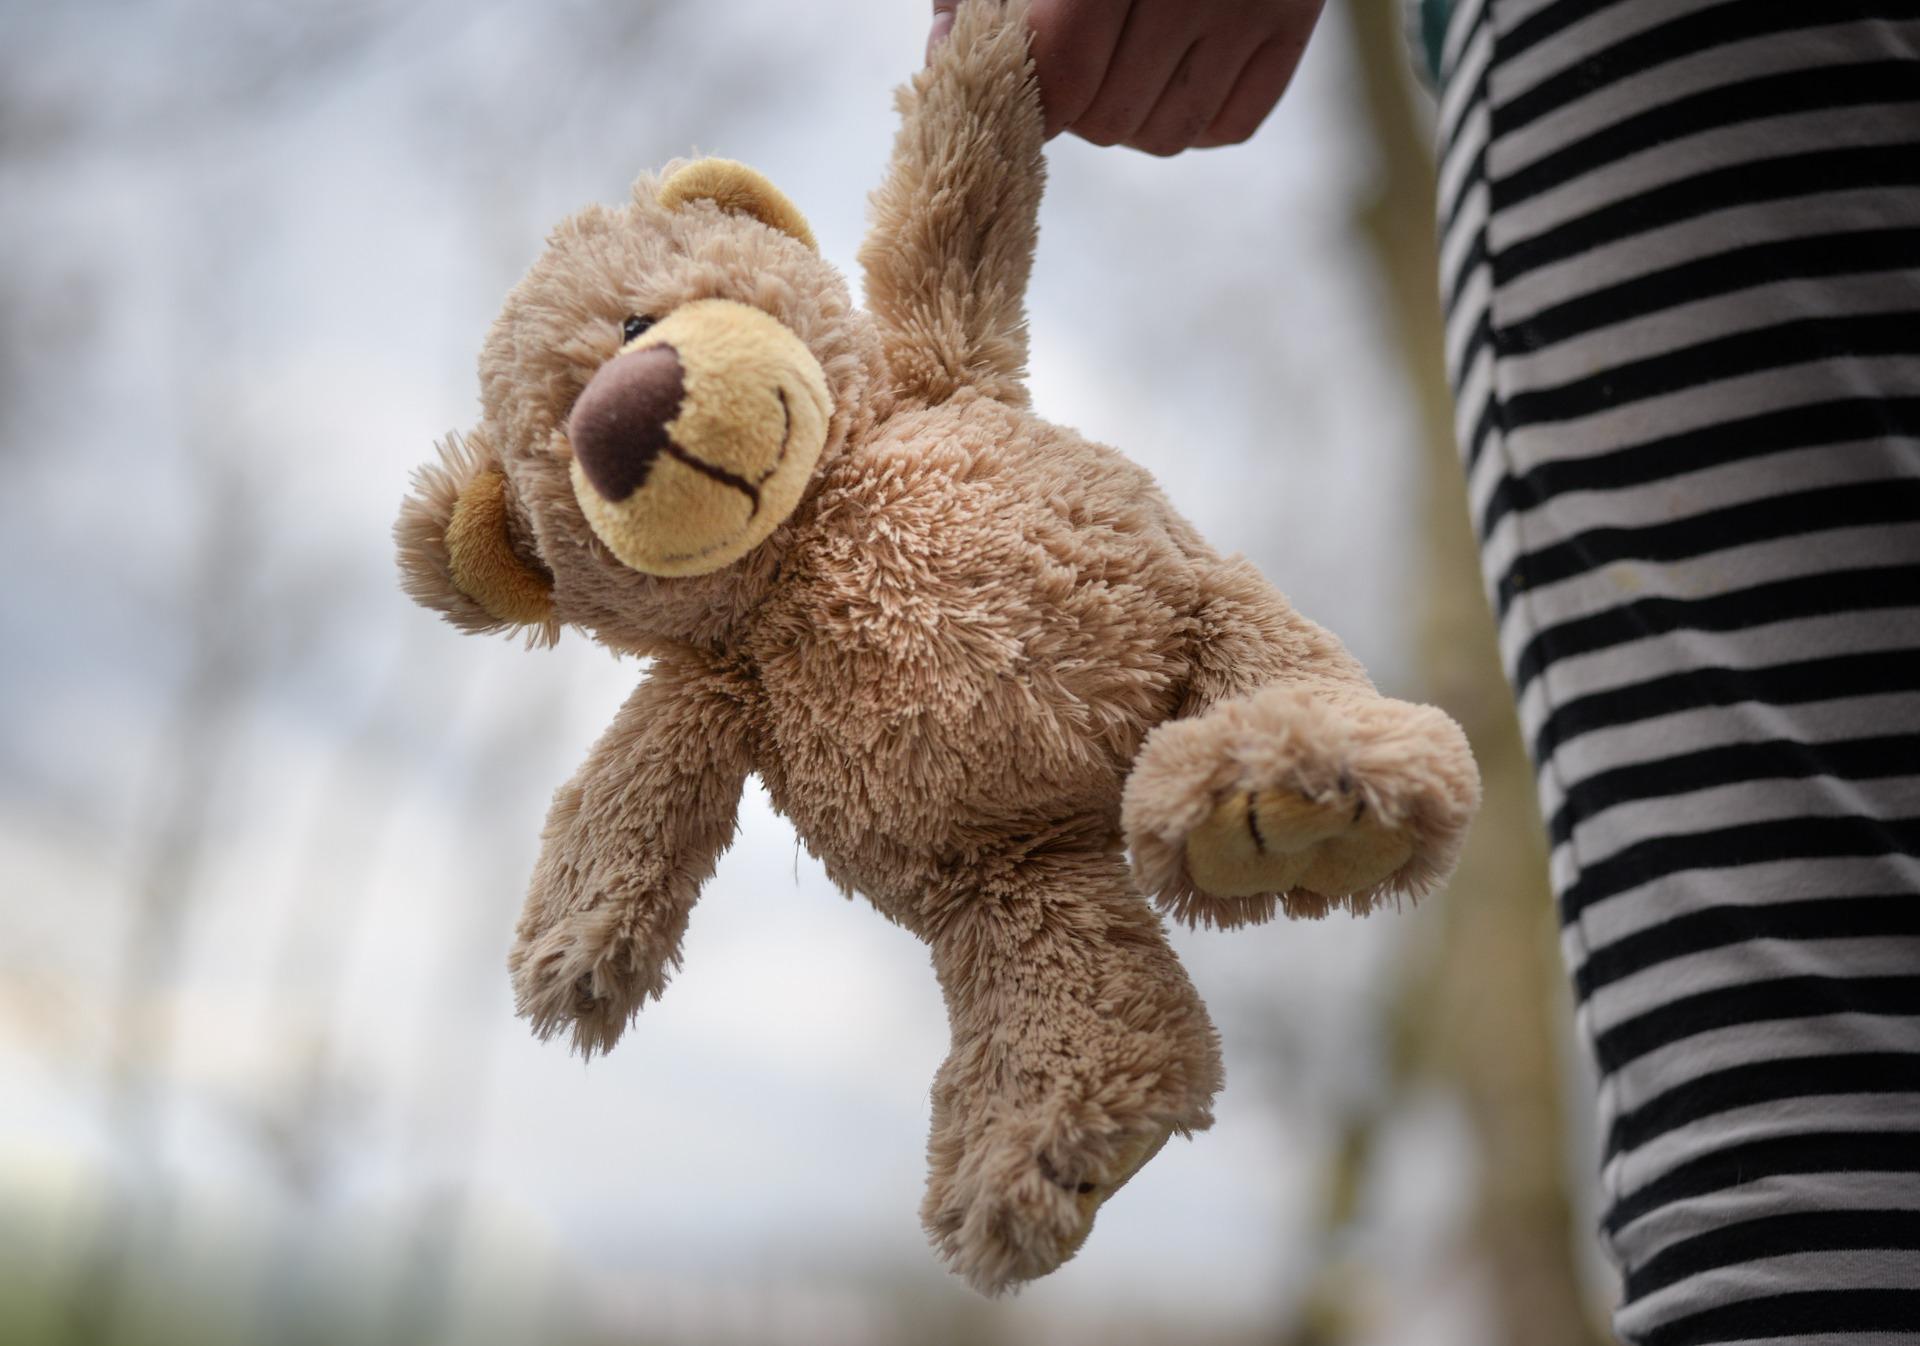 stuffed-bear-3288076_1920